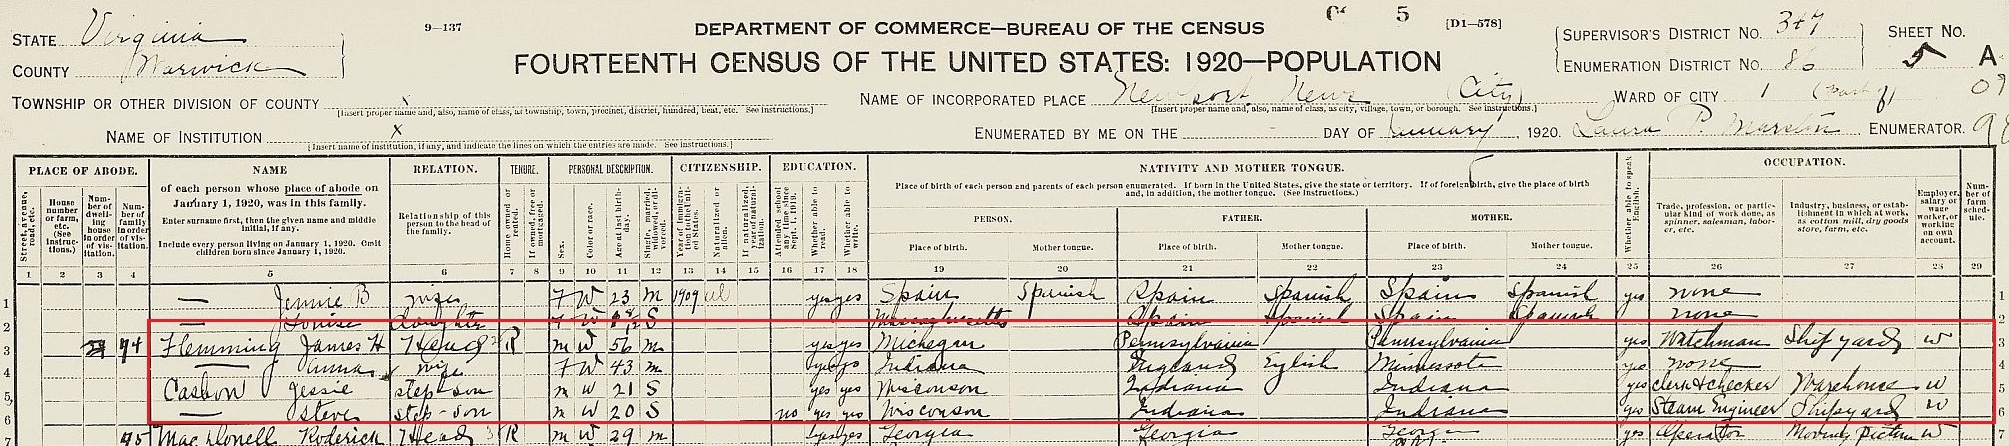 Fleming James b abt 1864 Mich 1920 census VA